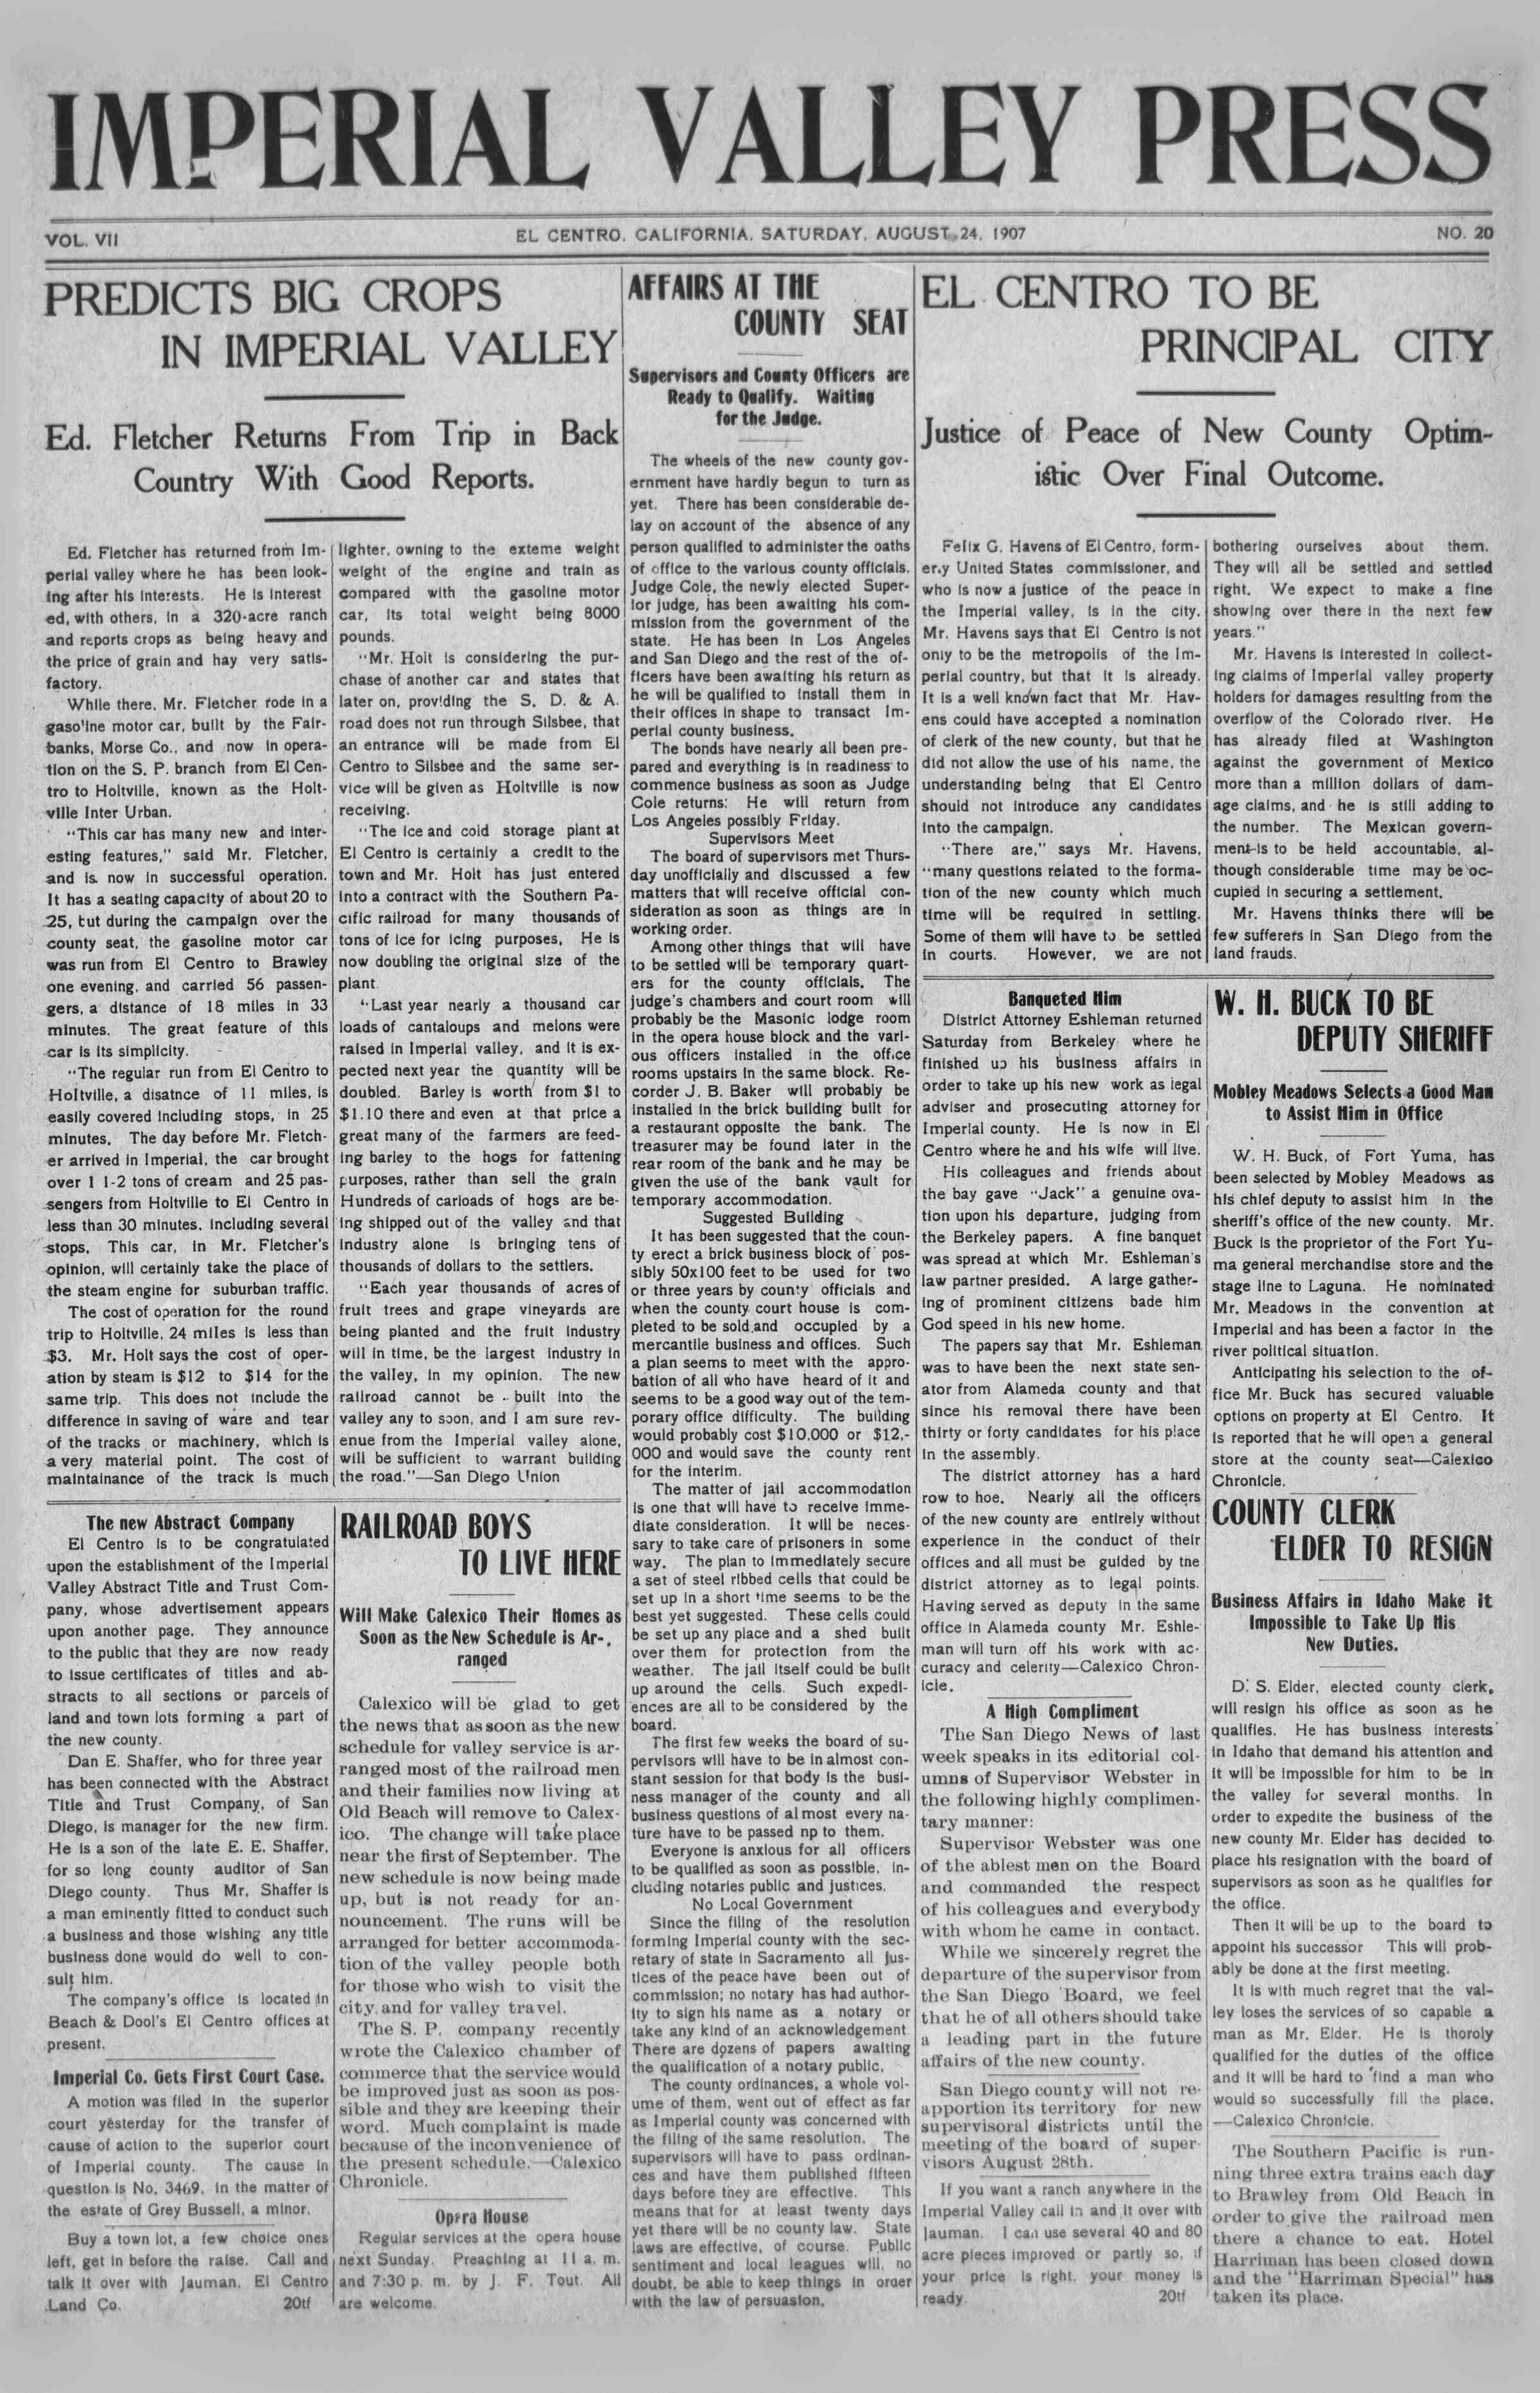 24 Ağustos 1907 Tarihli Imperial Valley Press Dergisi Sayfa 1